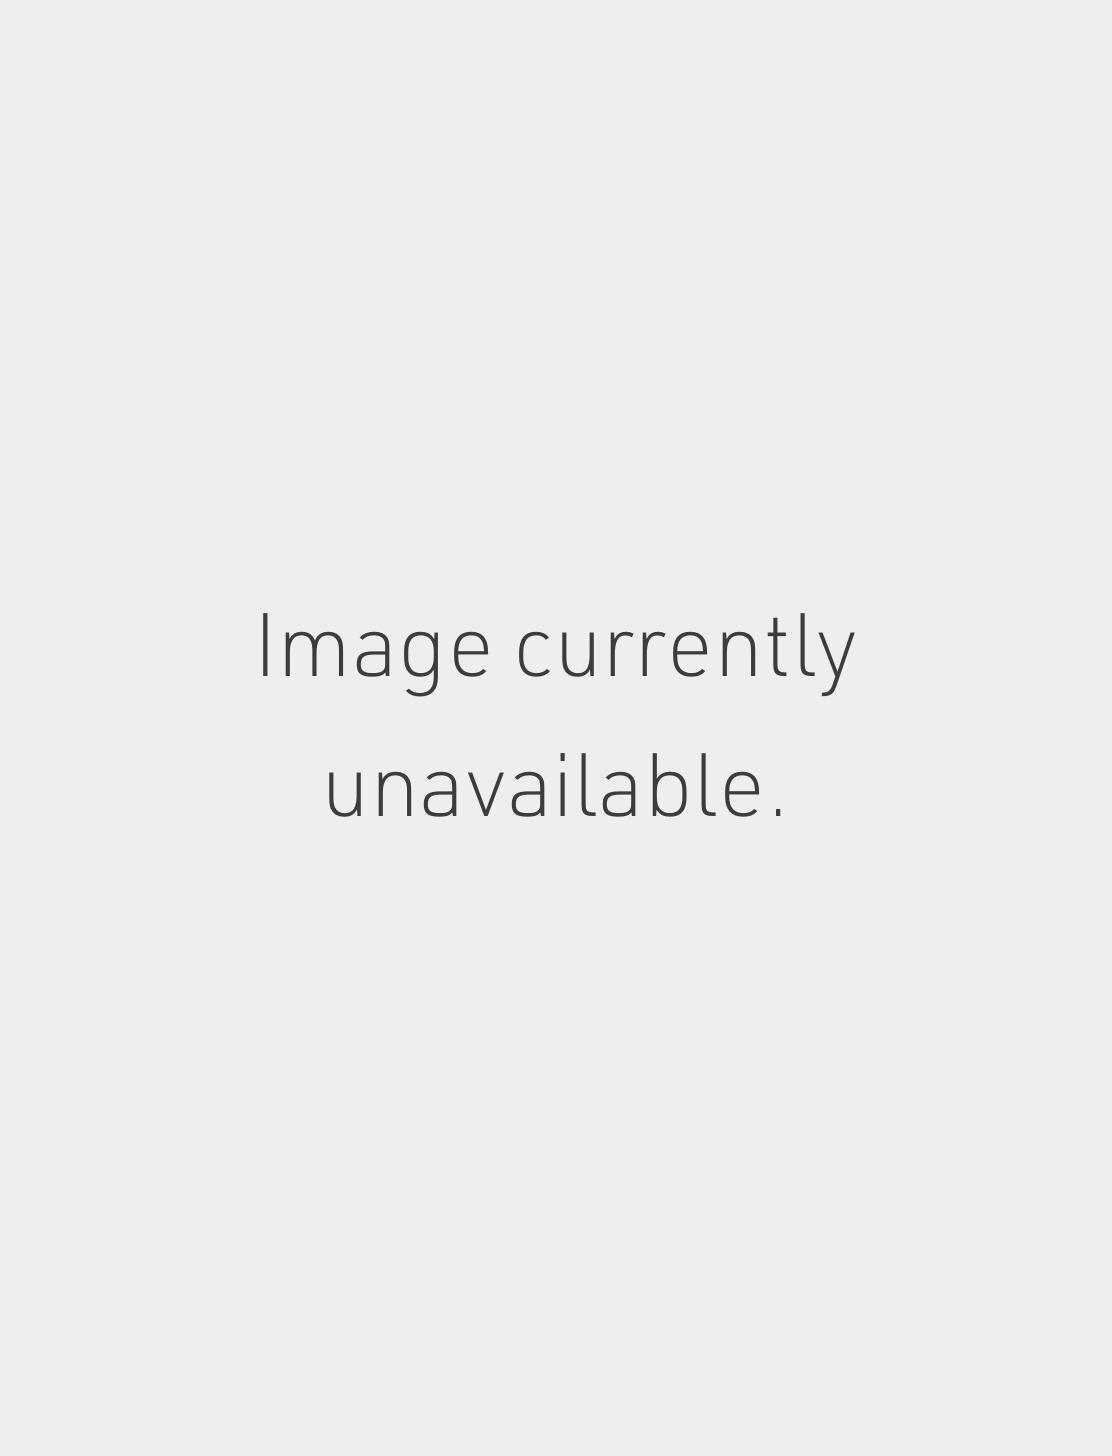 afa1d6e51 ... 2mm Diamond Princess Ring WHITE GOLD Image #model. View Fullscreen